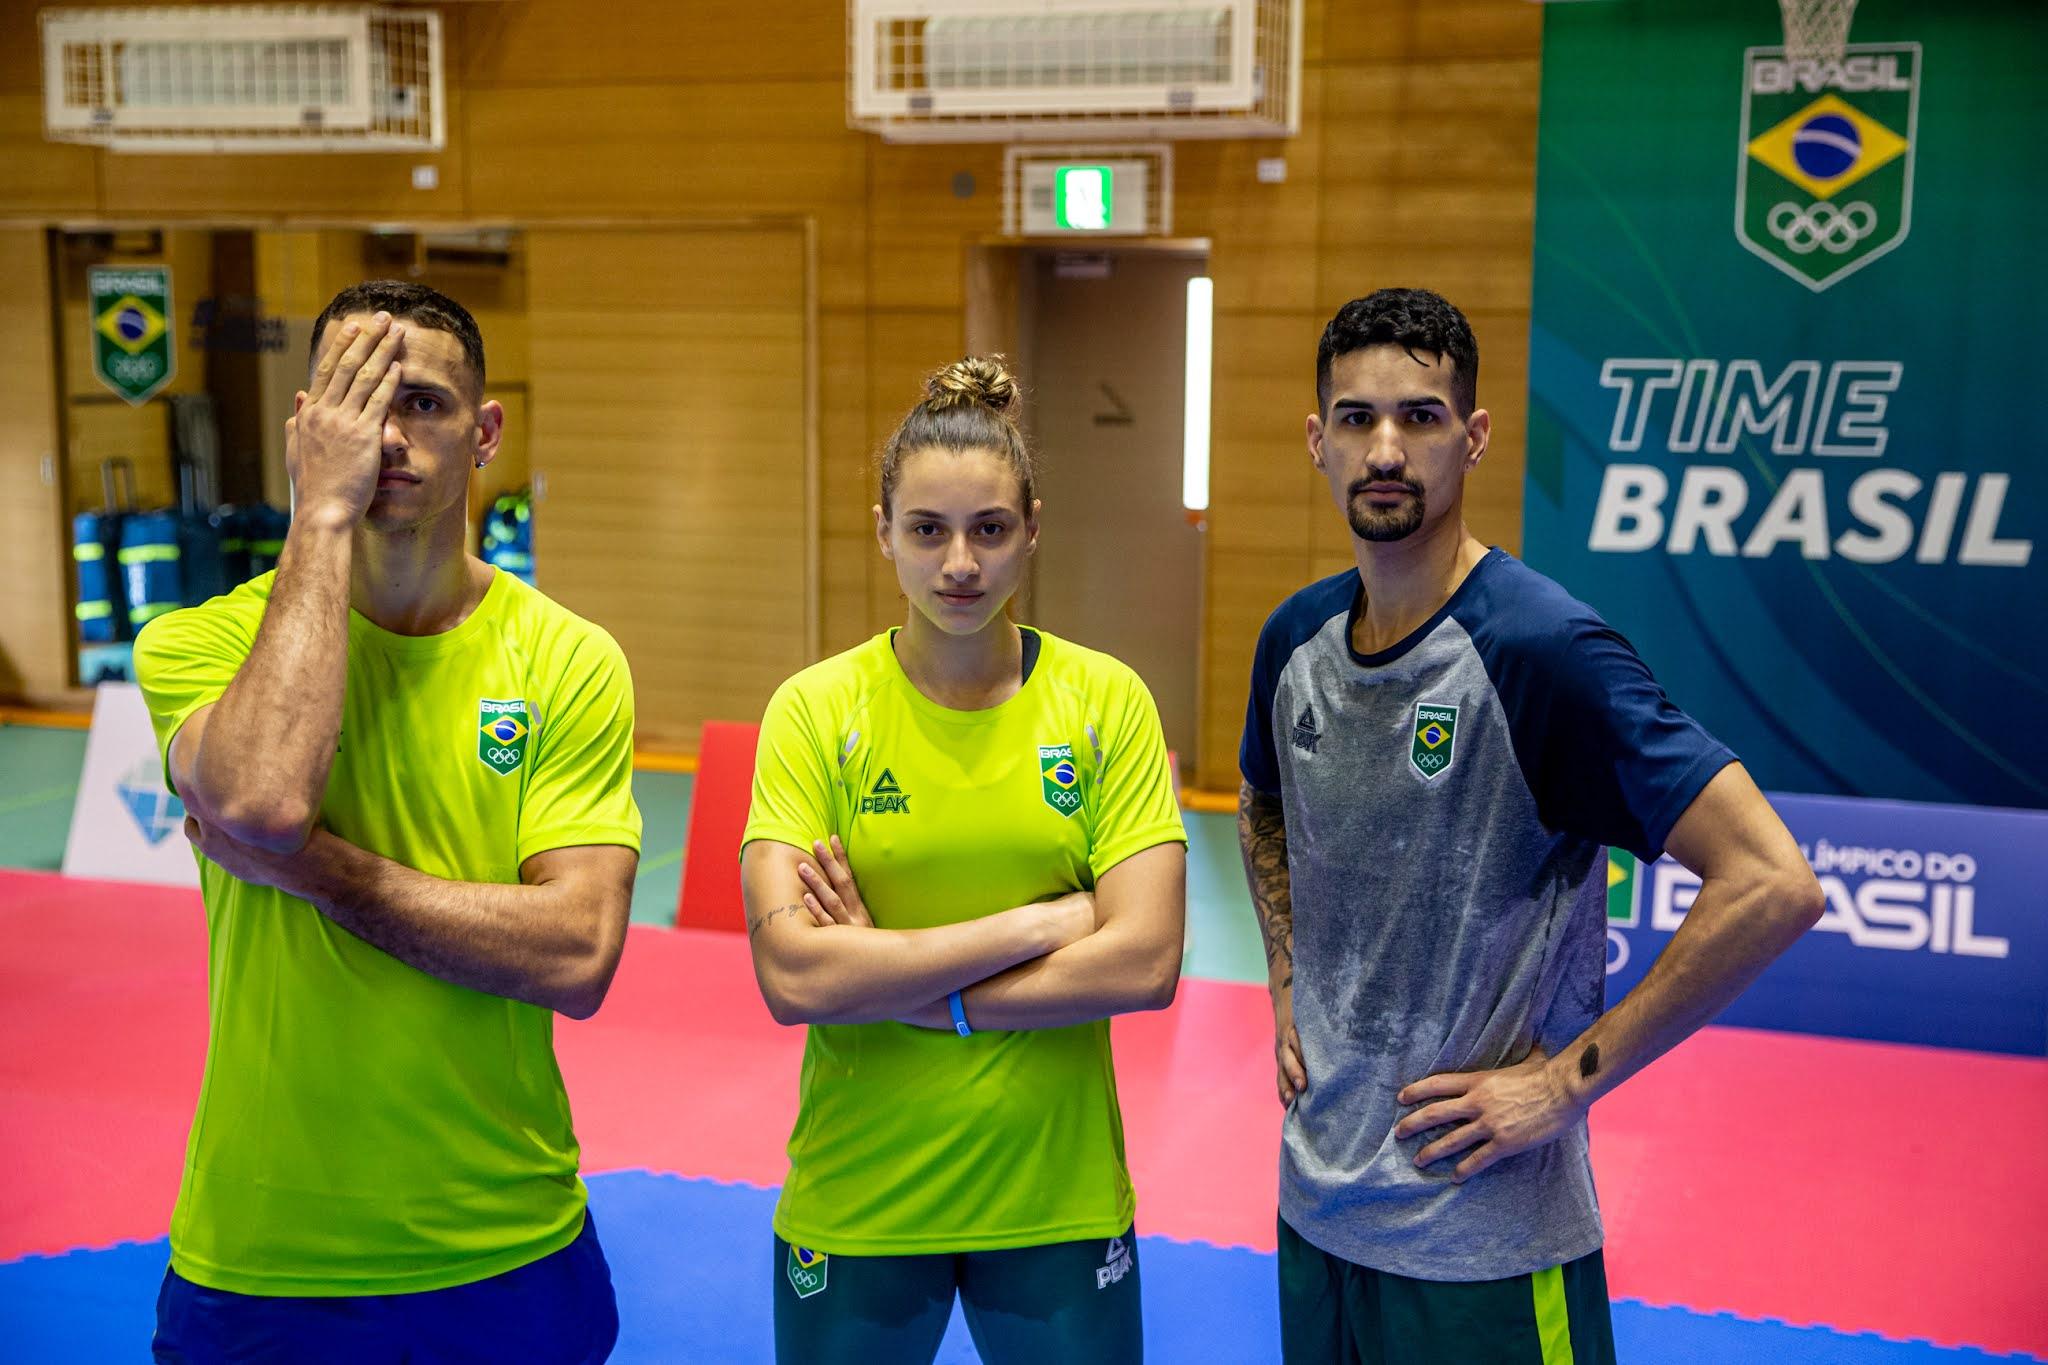 Brasileiros do taekwondo na Olimpíada